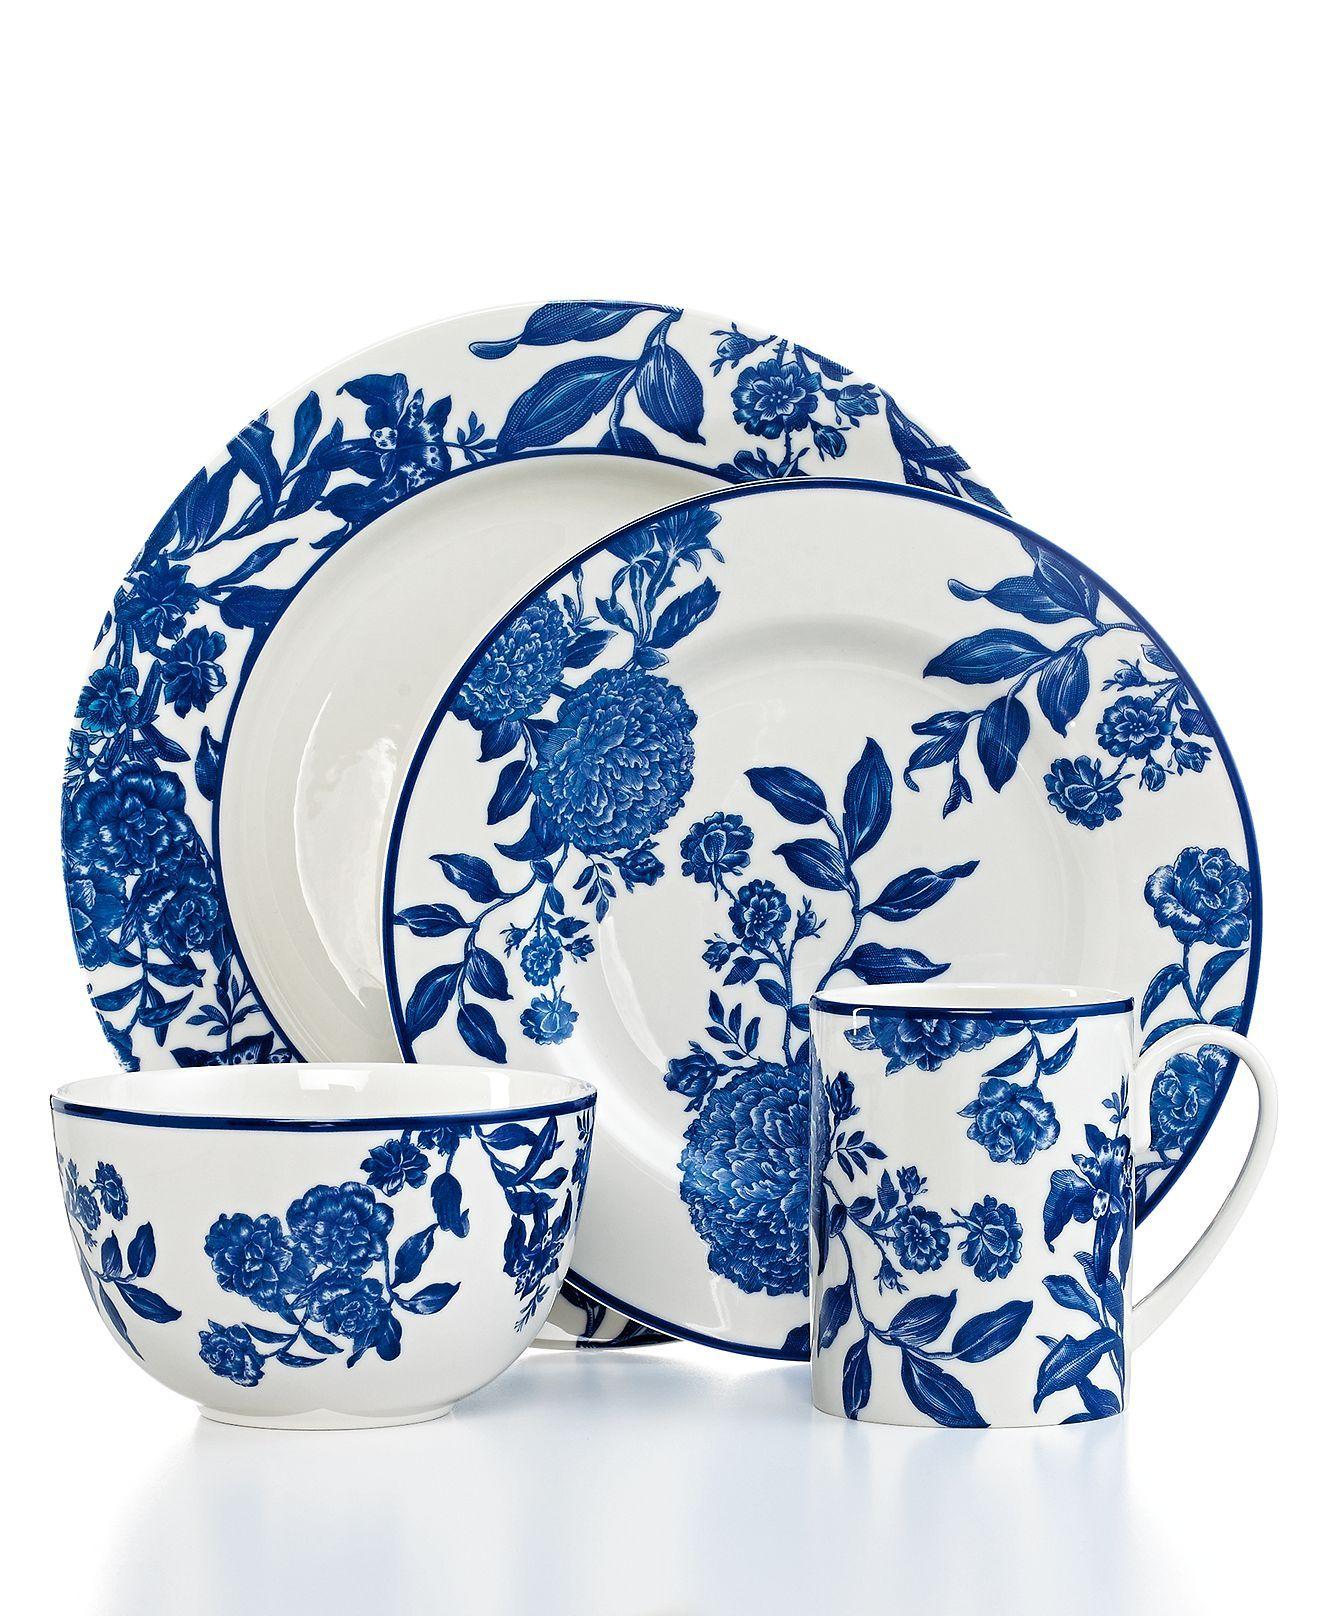 Martha Stewart Collection Orleans Cobalt Collection - Dinnerware - Dining \u0026 Entertaining - Macy\u0027s Bridal and Wedding Registry  sc 1 st  Pinterest & Martha Stewart Collection Orleans Cobalt   Dinnerware/Dish Sets ...